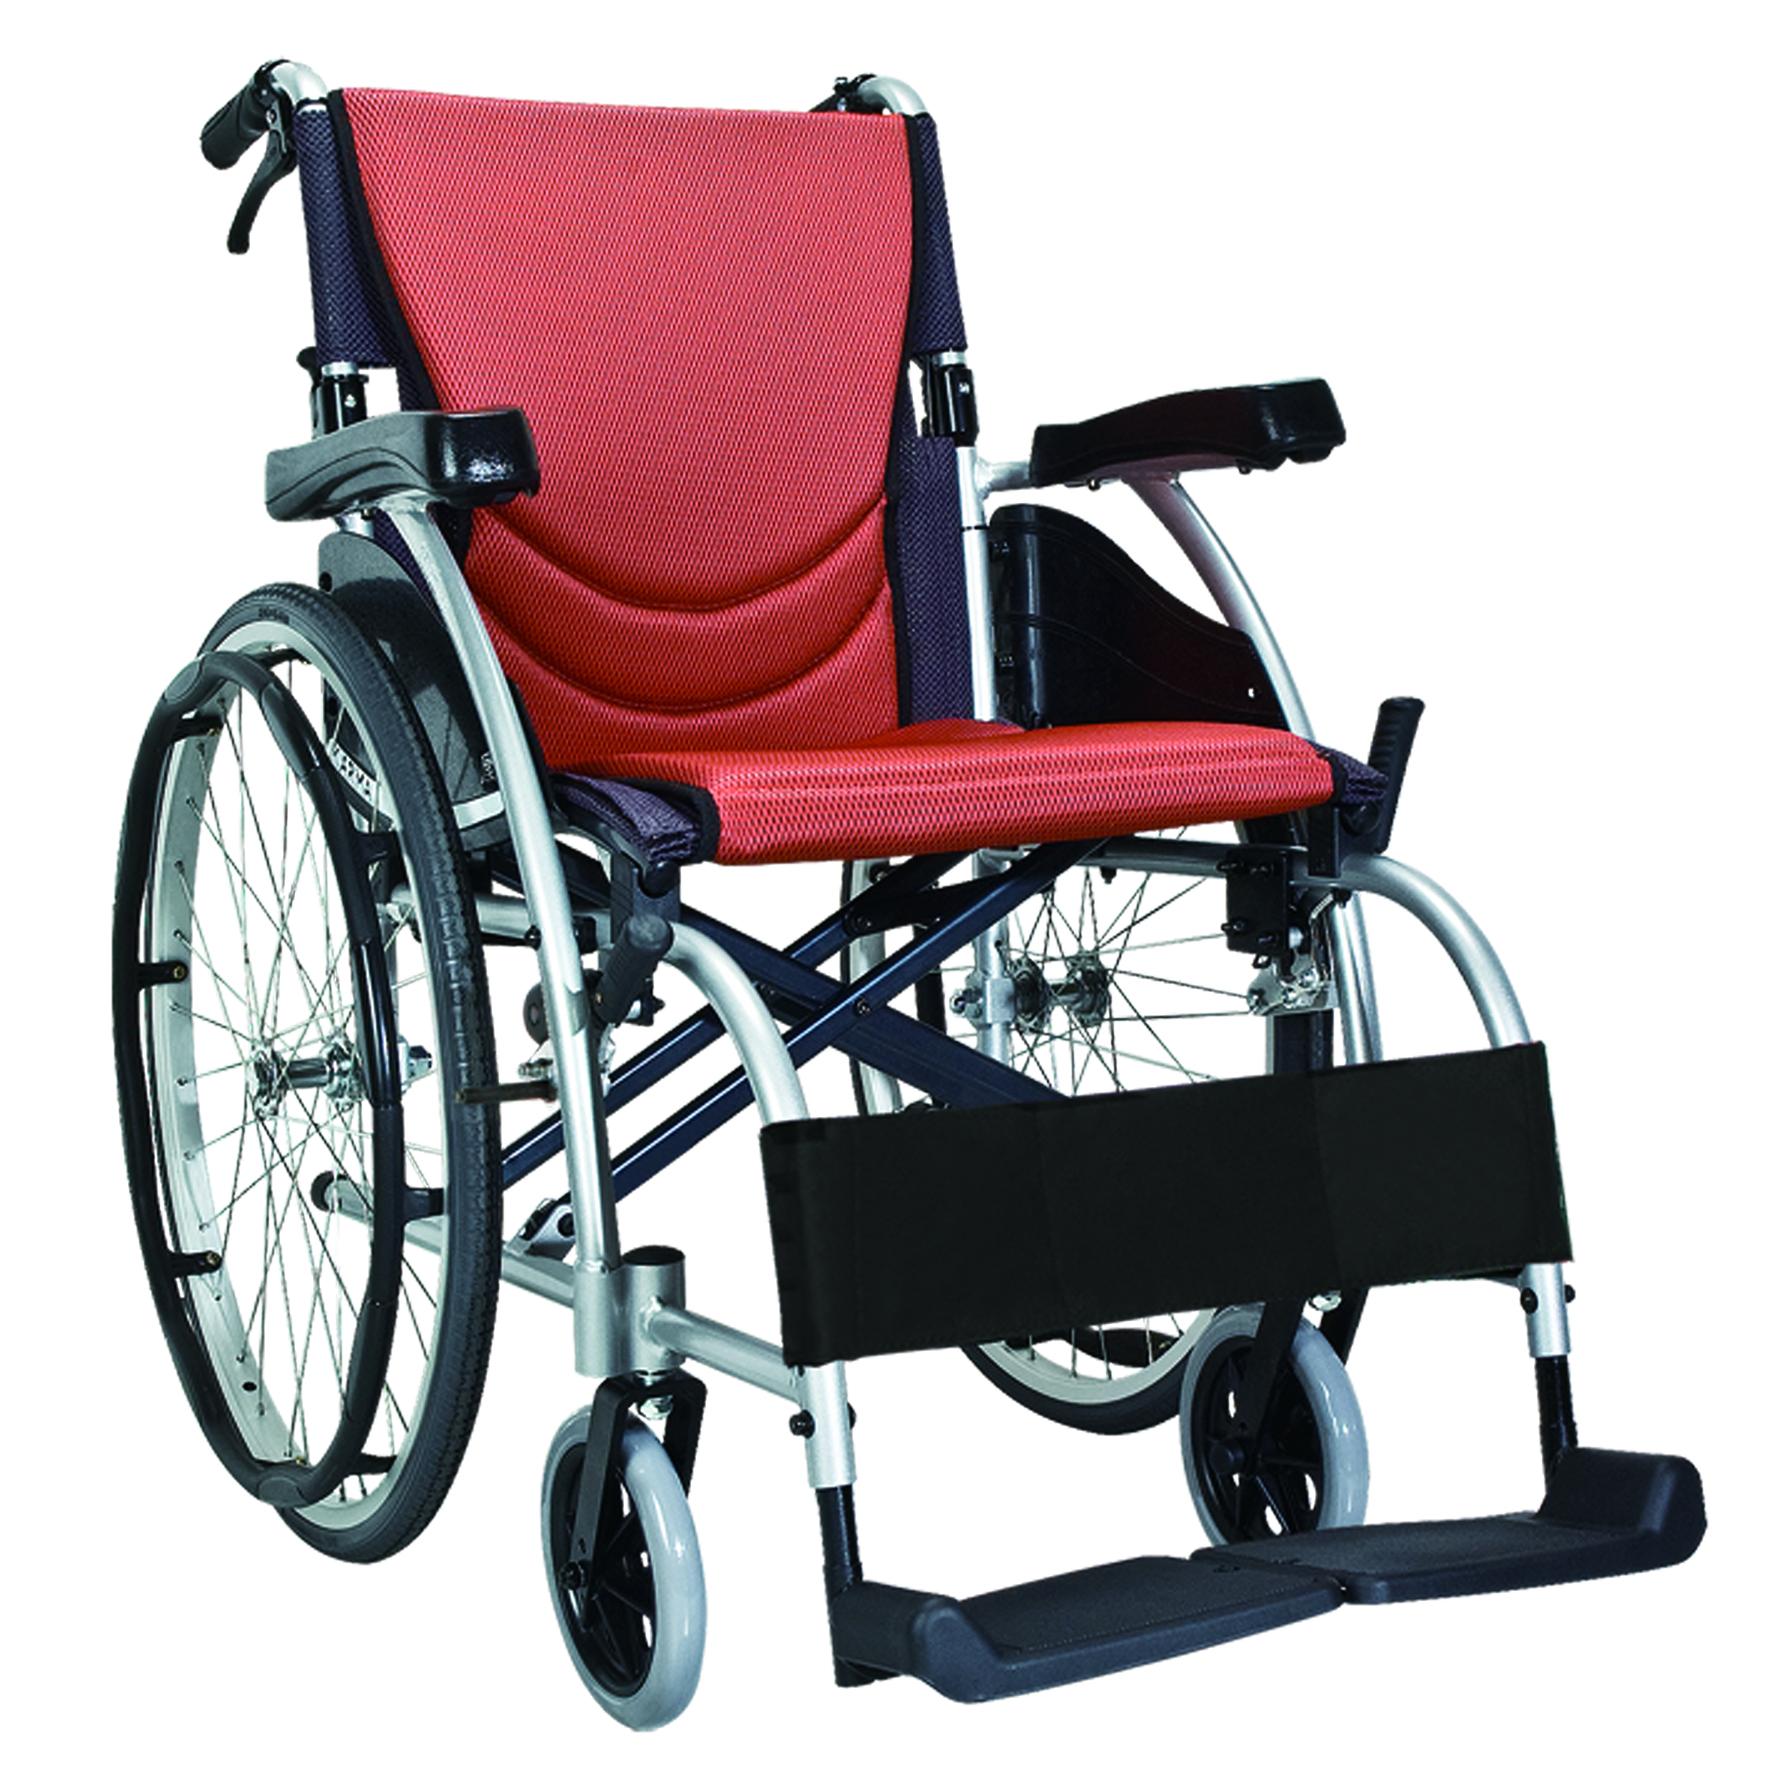 KARMA MEDICAL PRODUCTS CO., LTD.-Eukarma Wheelchair